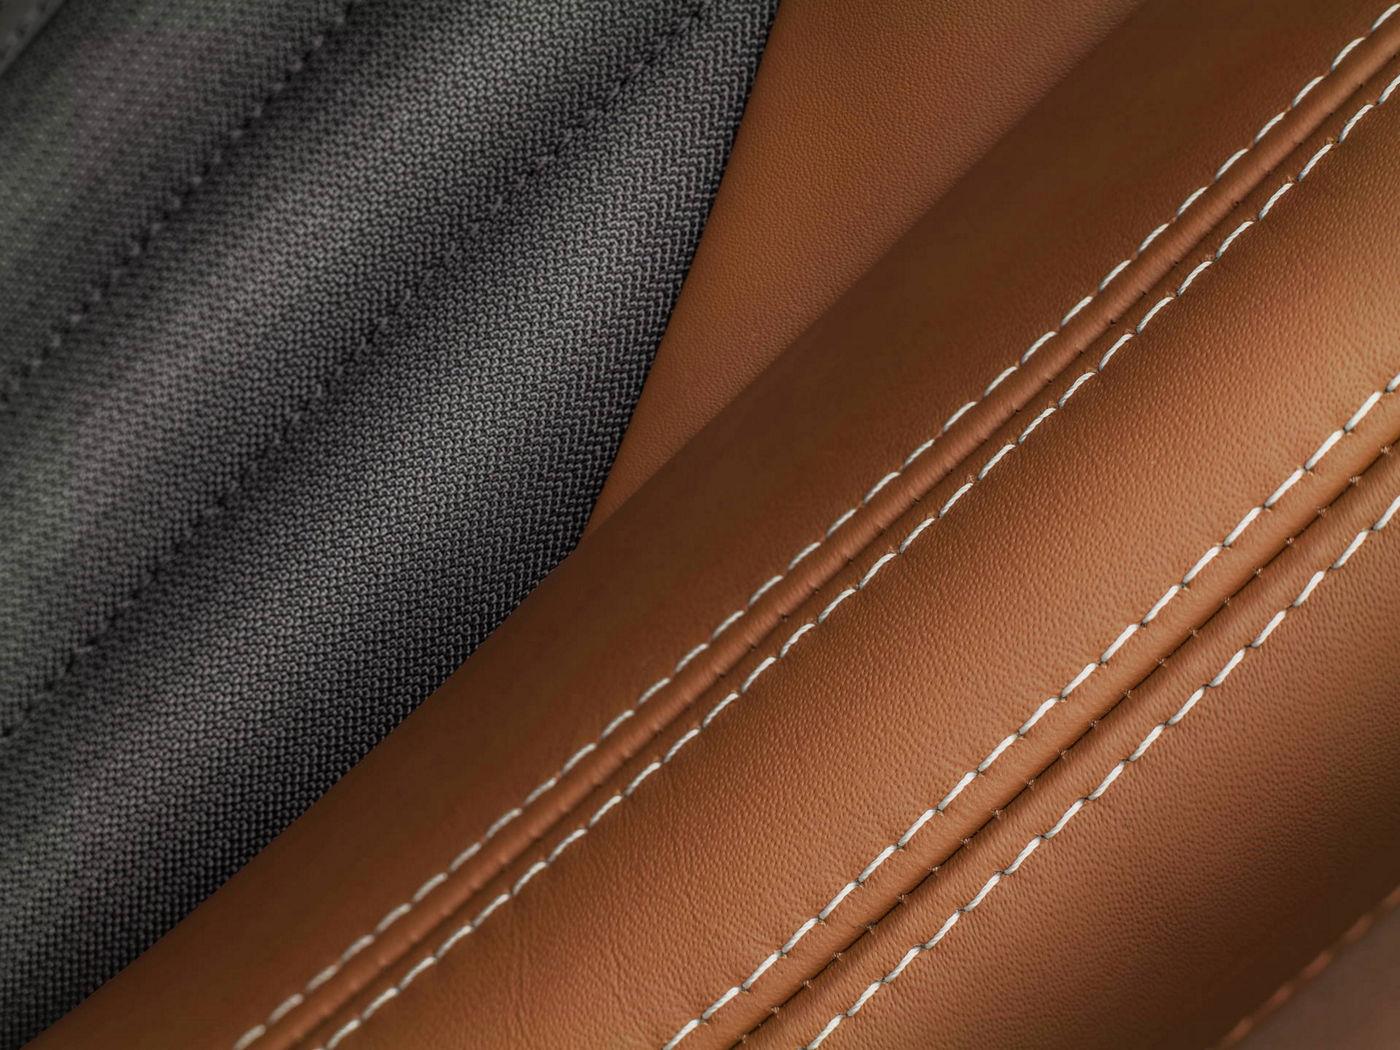 Maserati fabric, leather and stitching interior details by Ermenegildo Zegna